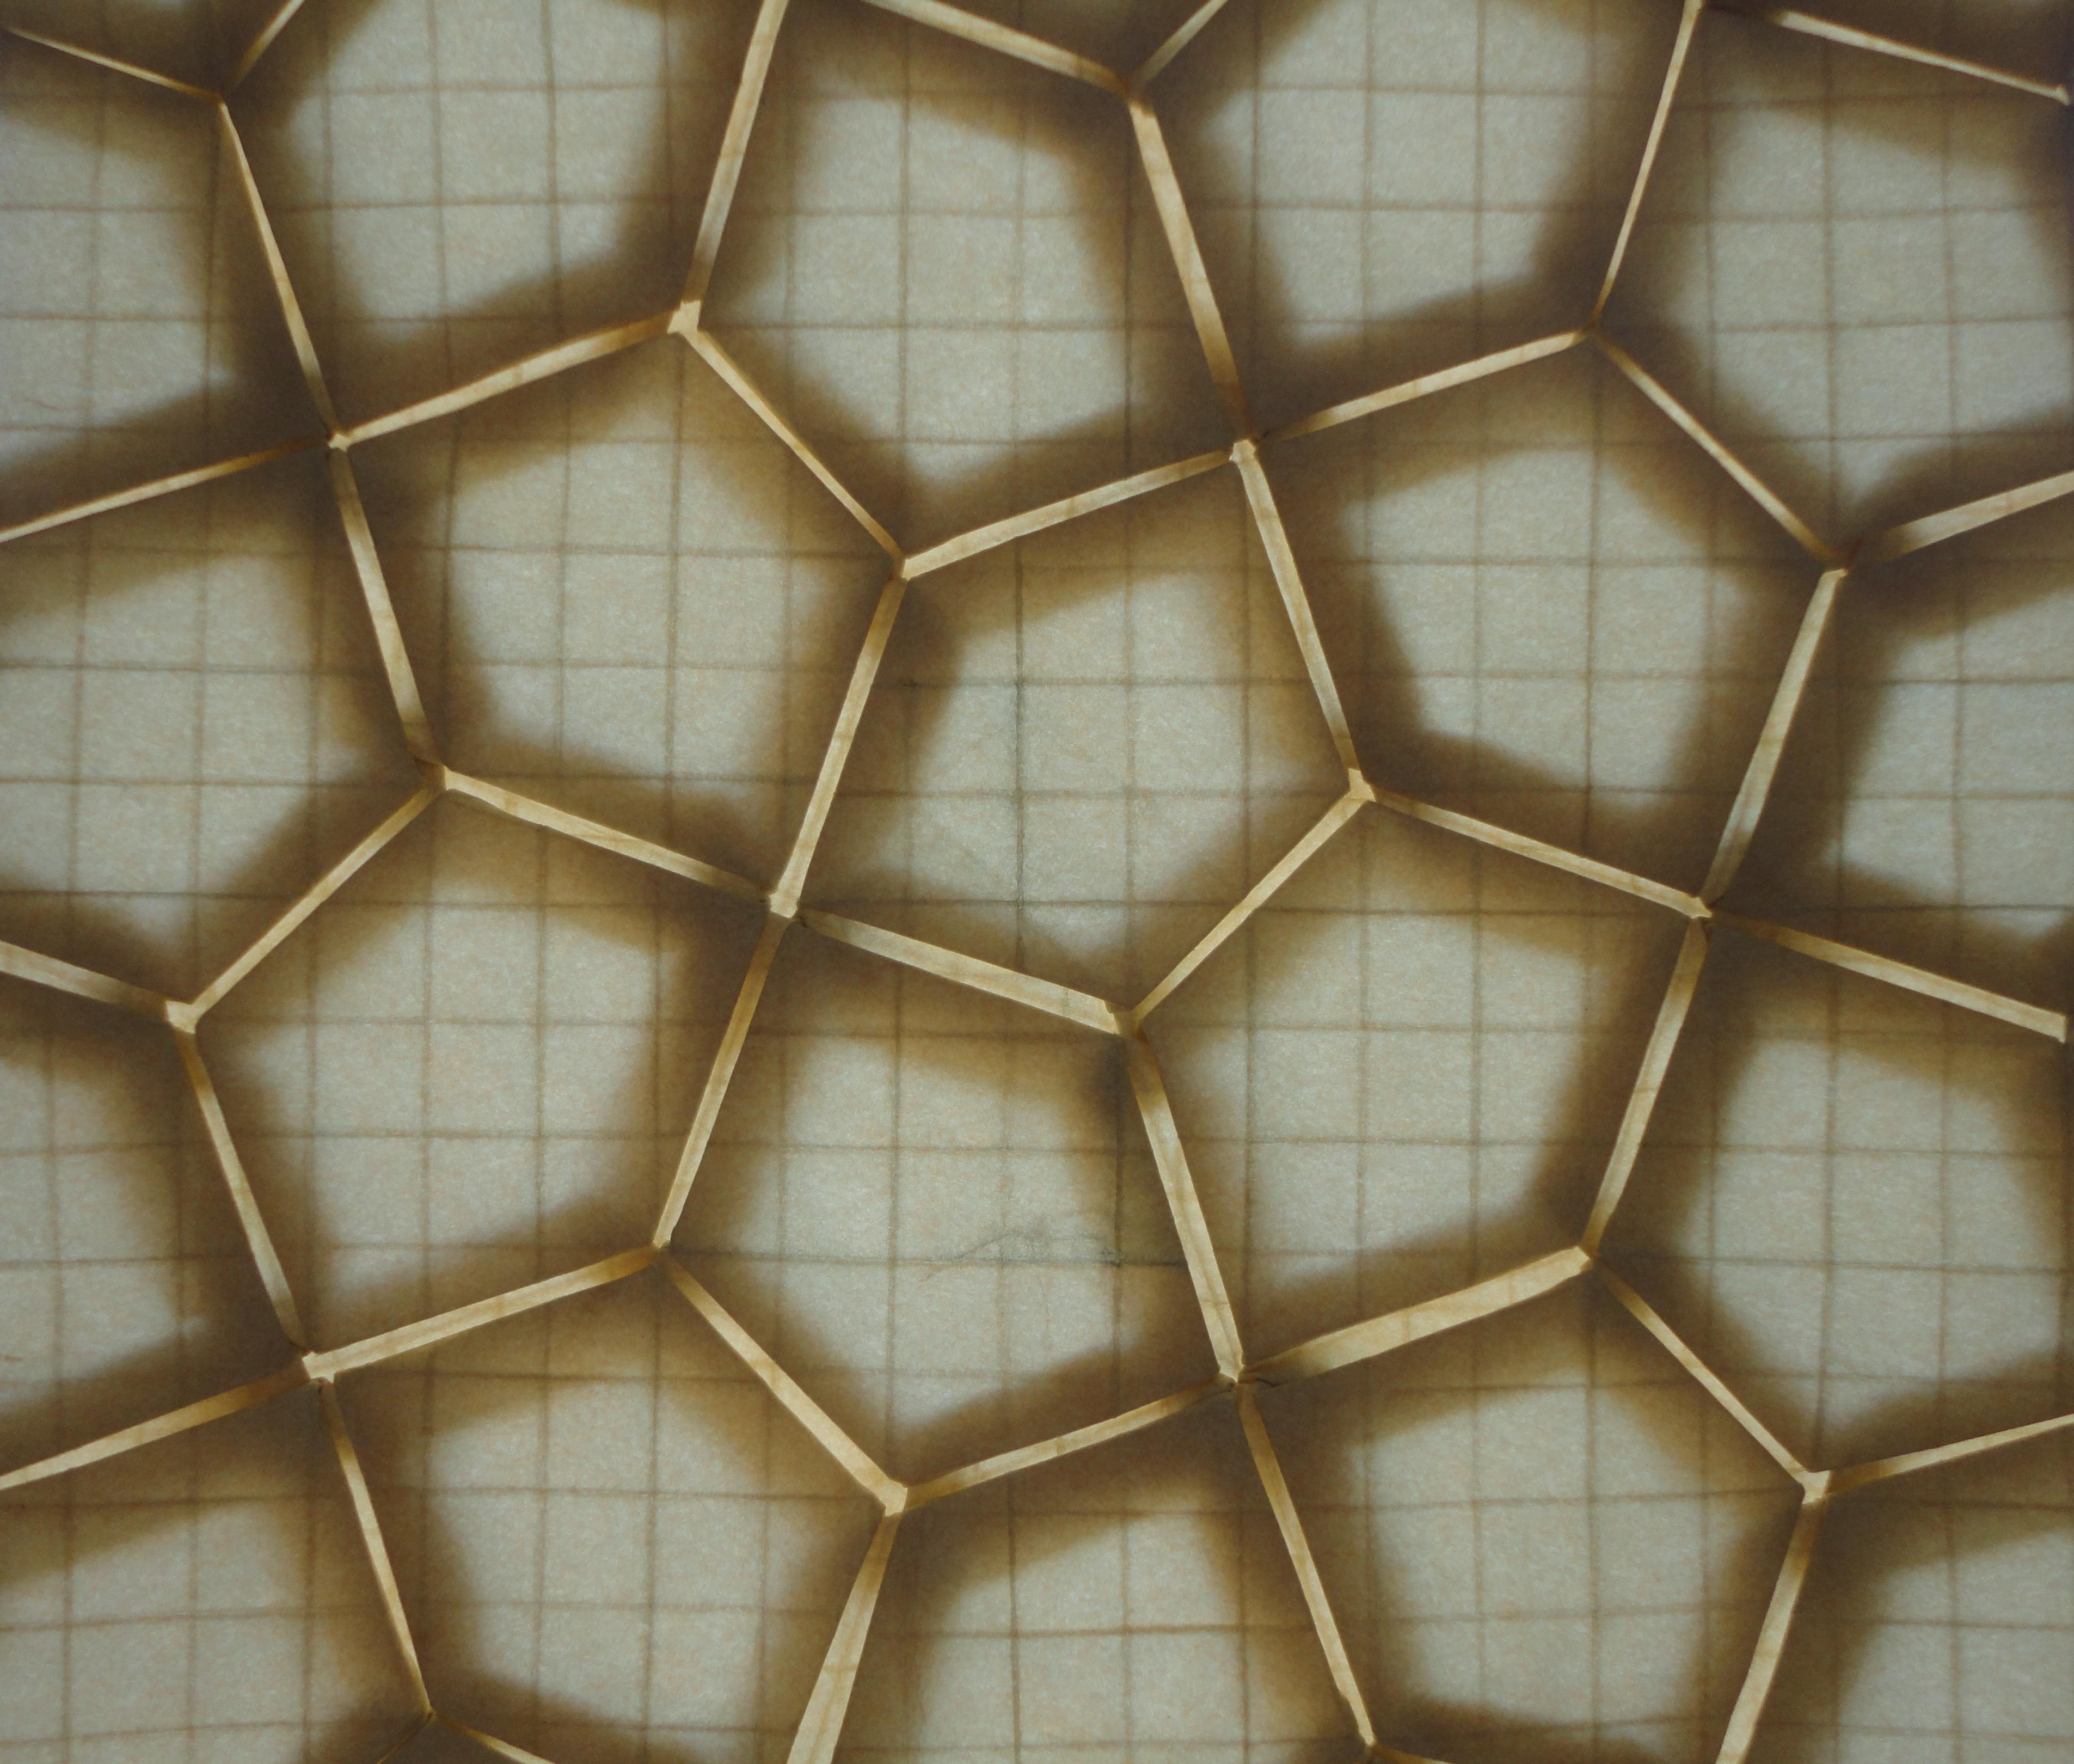 Cairo_Tessellation-Eric_Gjerde_1